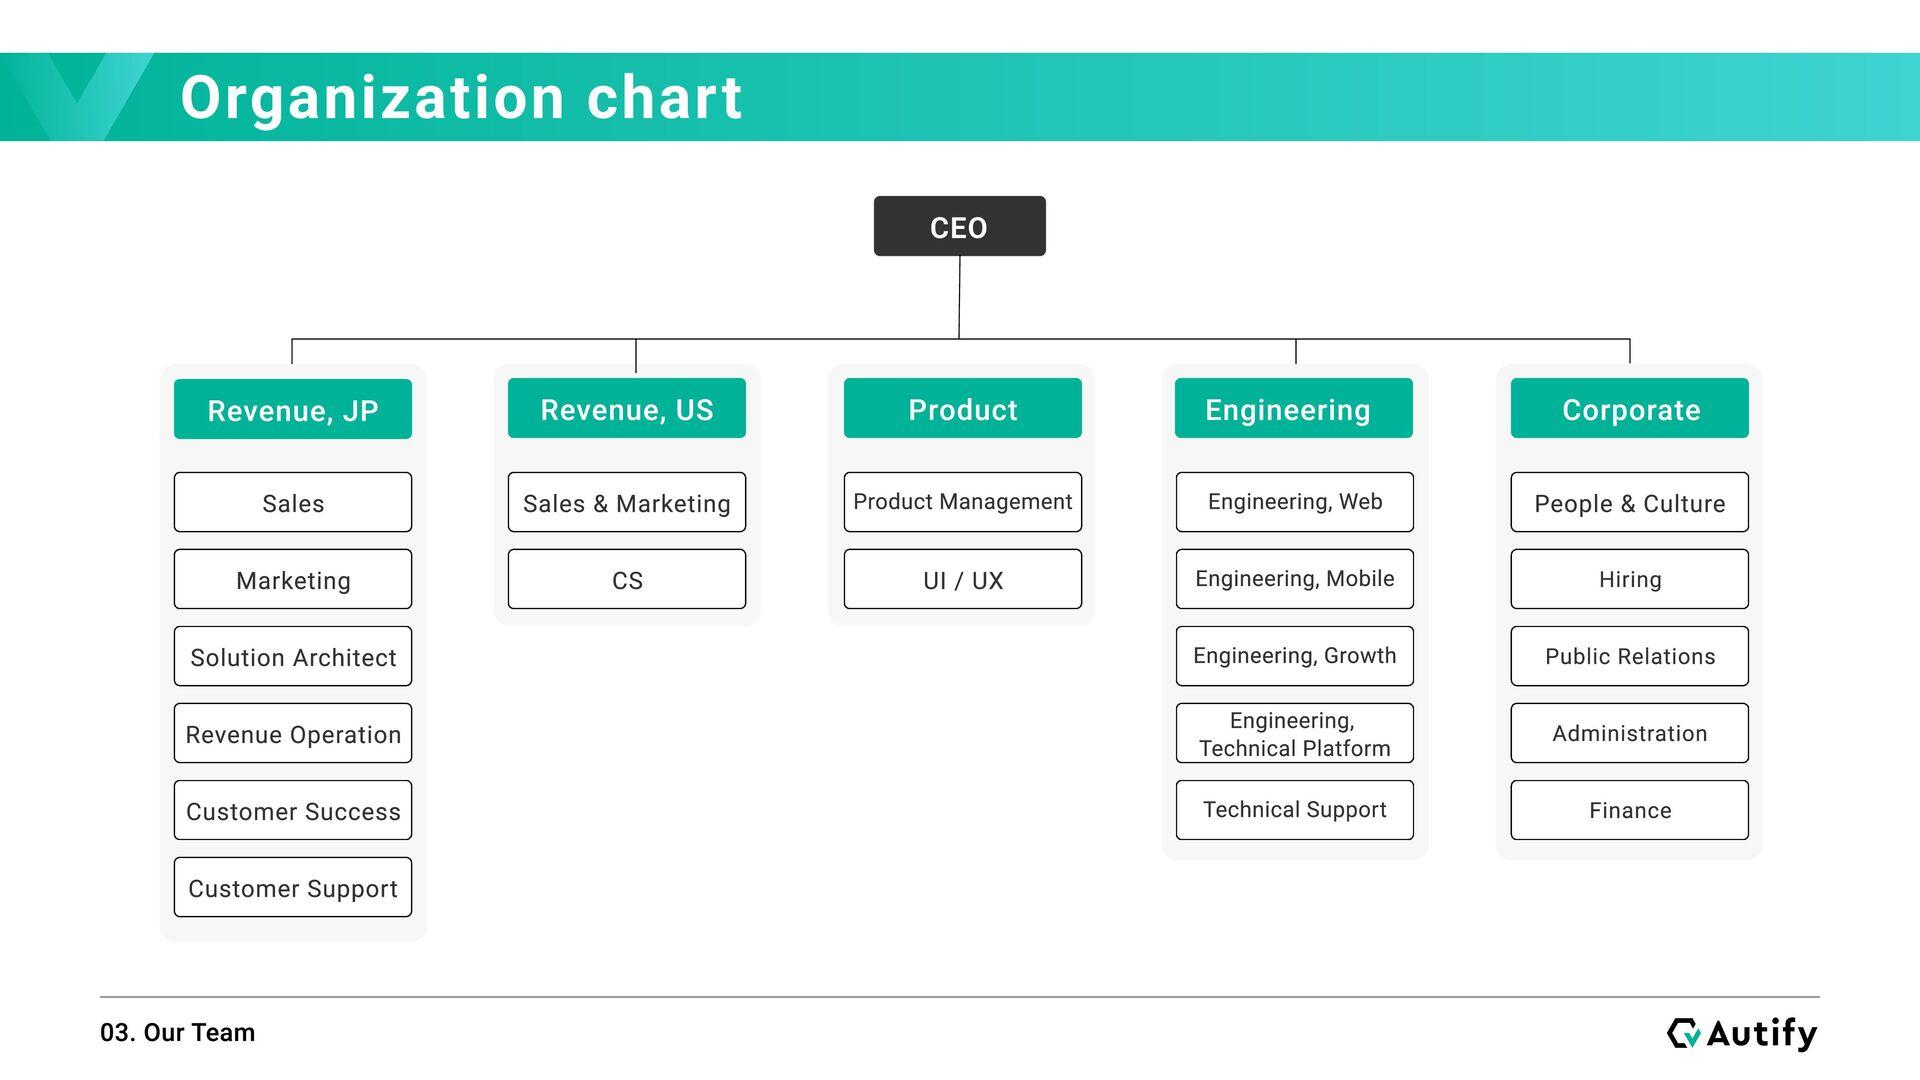 Basic Information 04. Work Environment - Flexti...